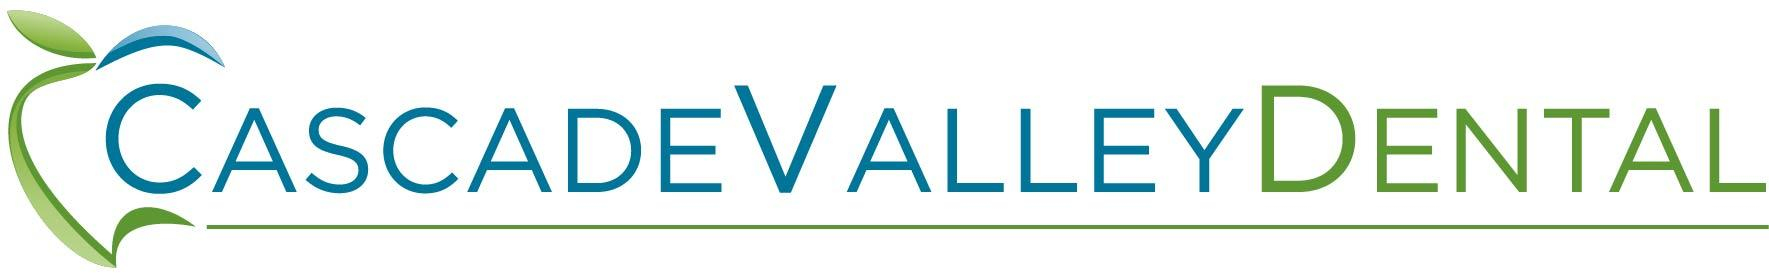 Cascade Valley Dental